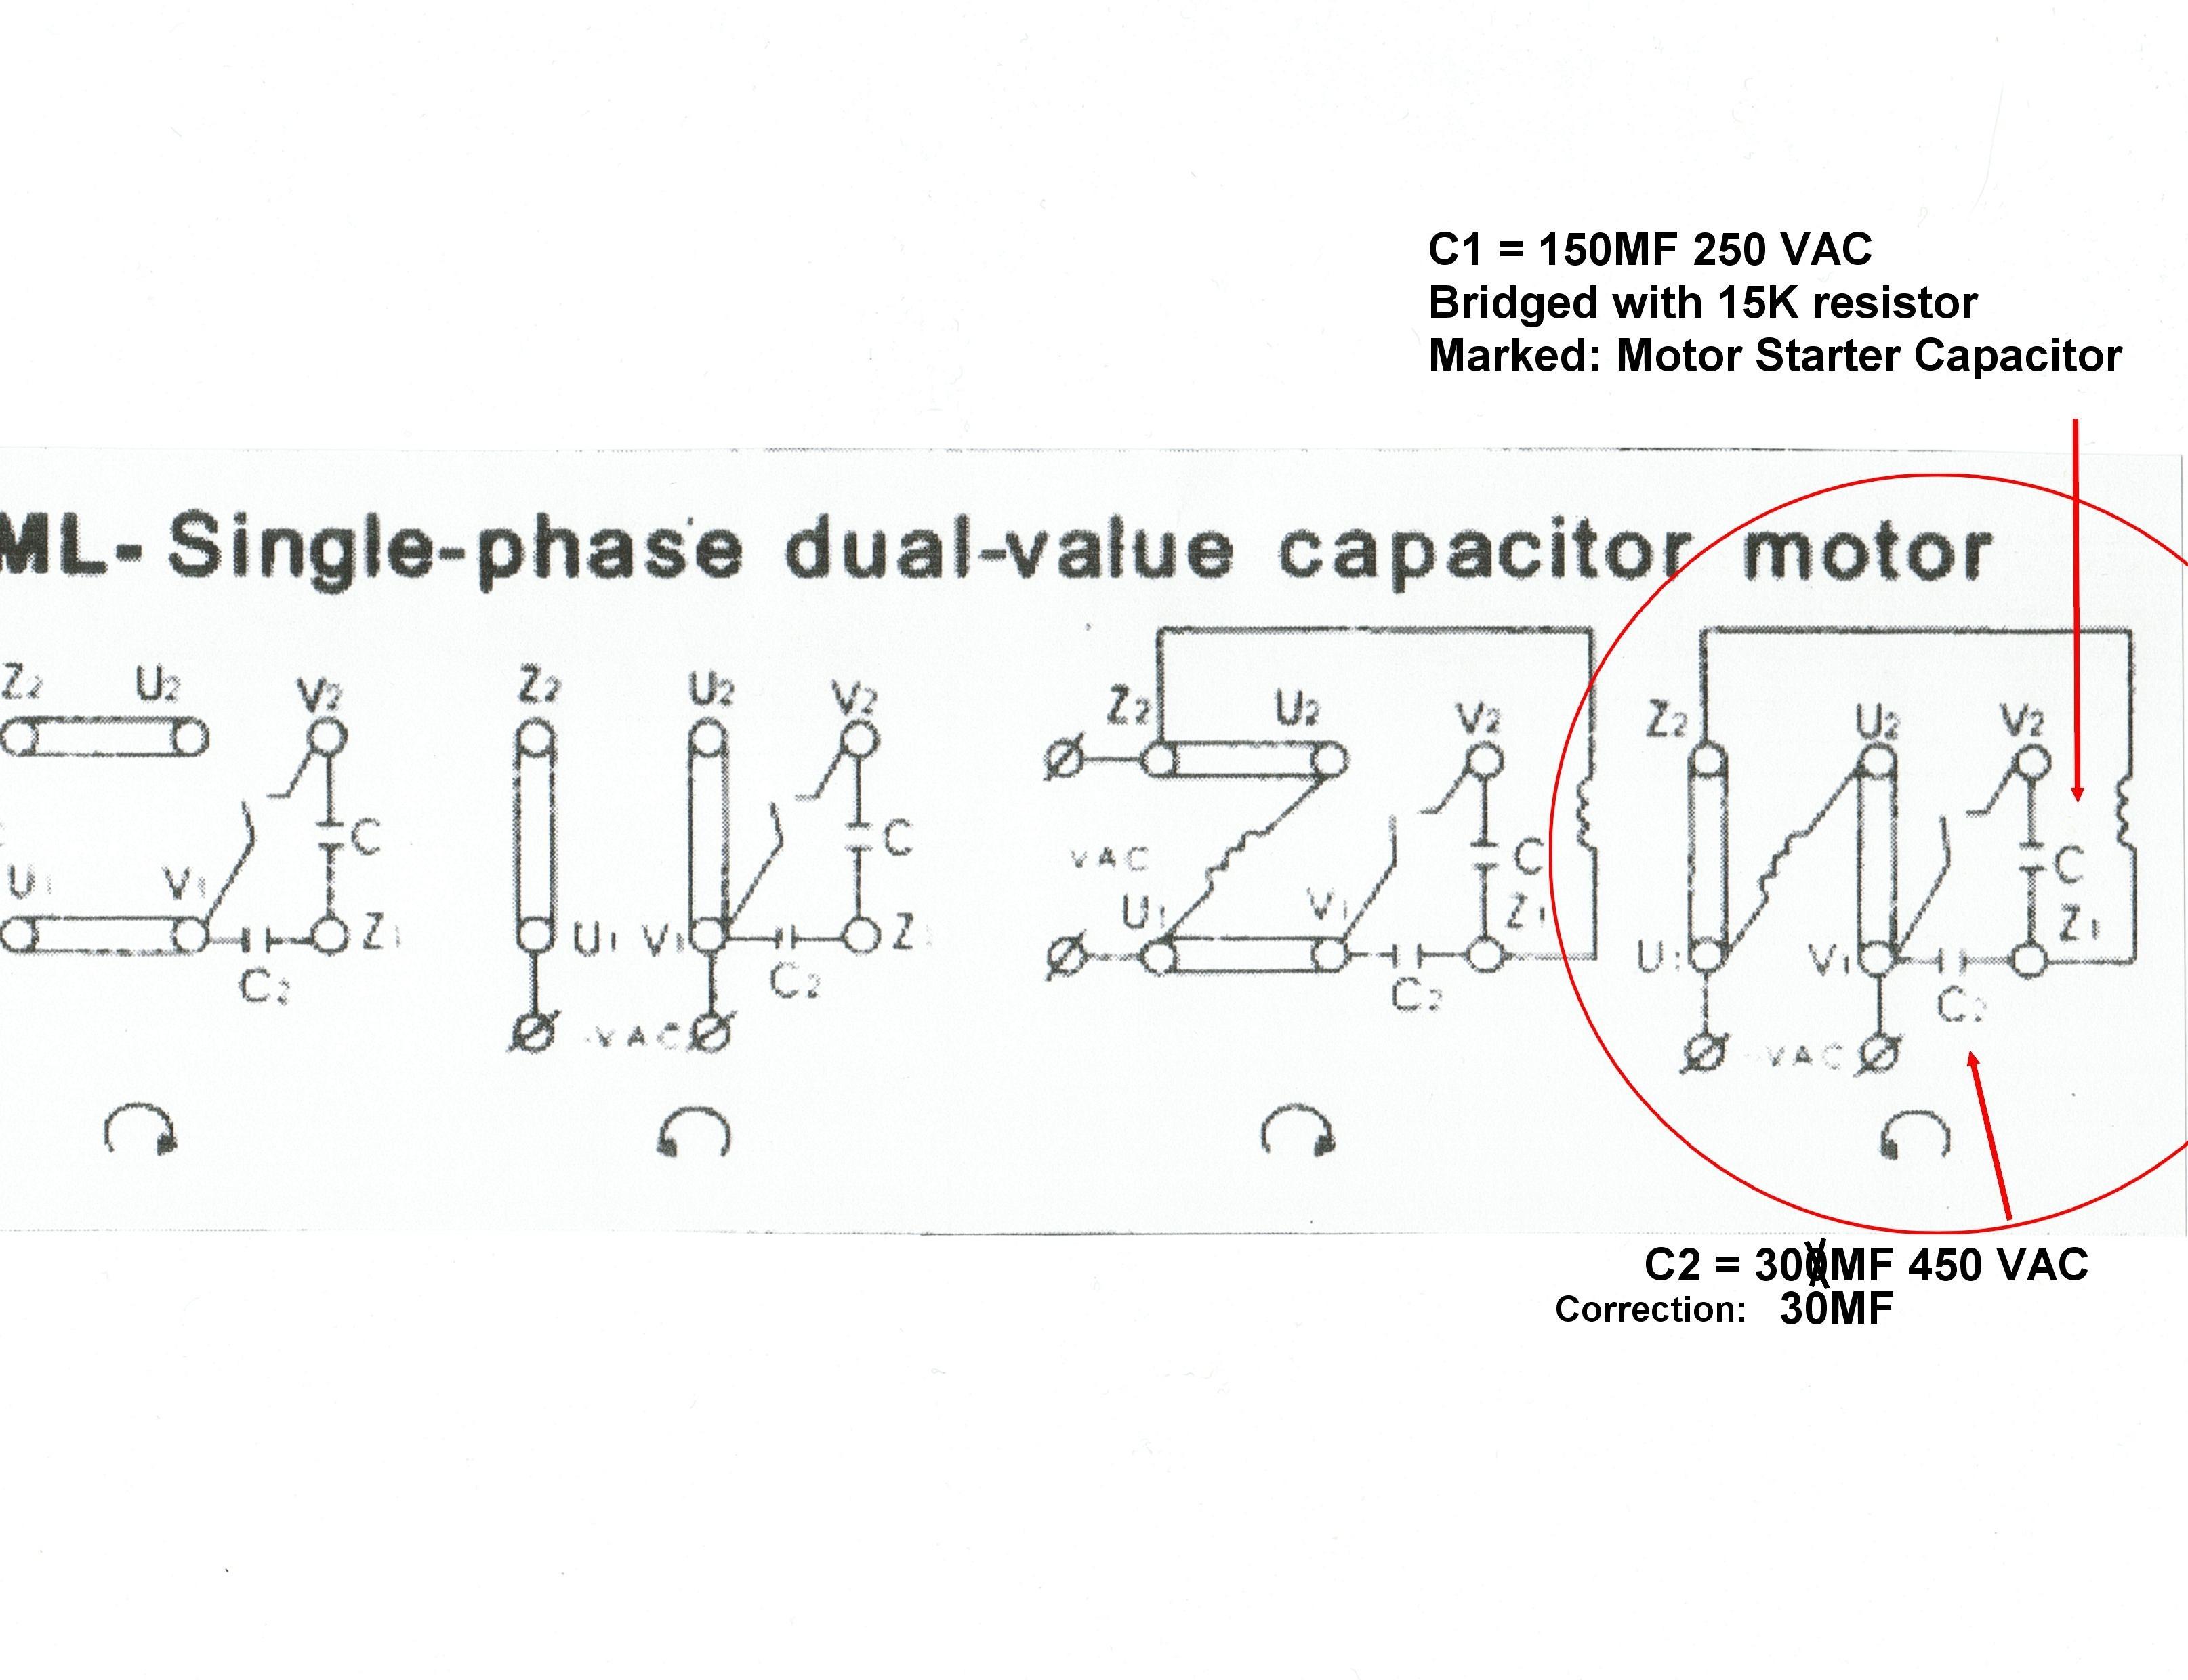 Century Ac Motor Wiring Diagram 115 230 Volts Beautiful Amazing Dayton Electric Motors Wiring Diagram Capacitor S